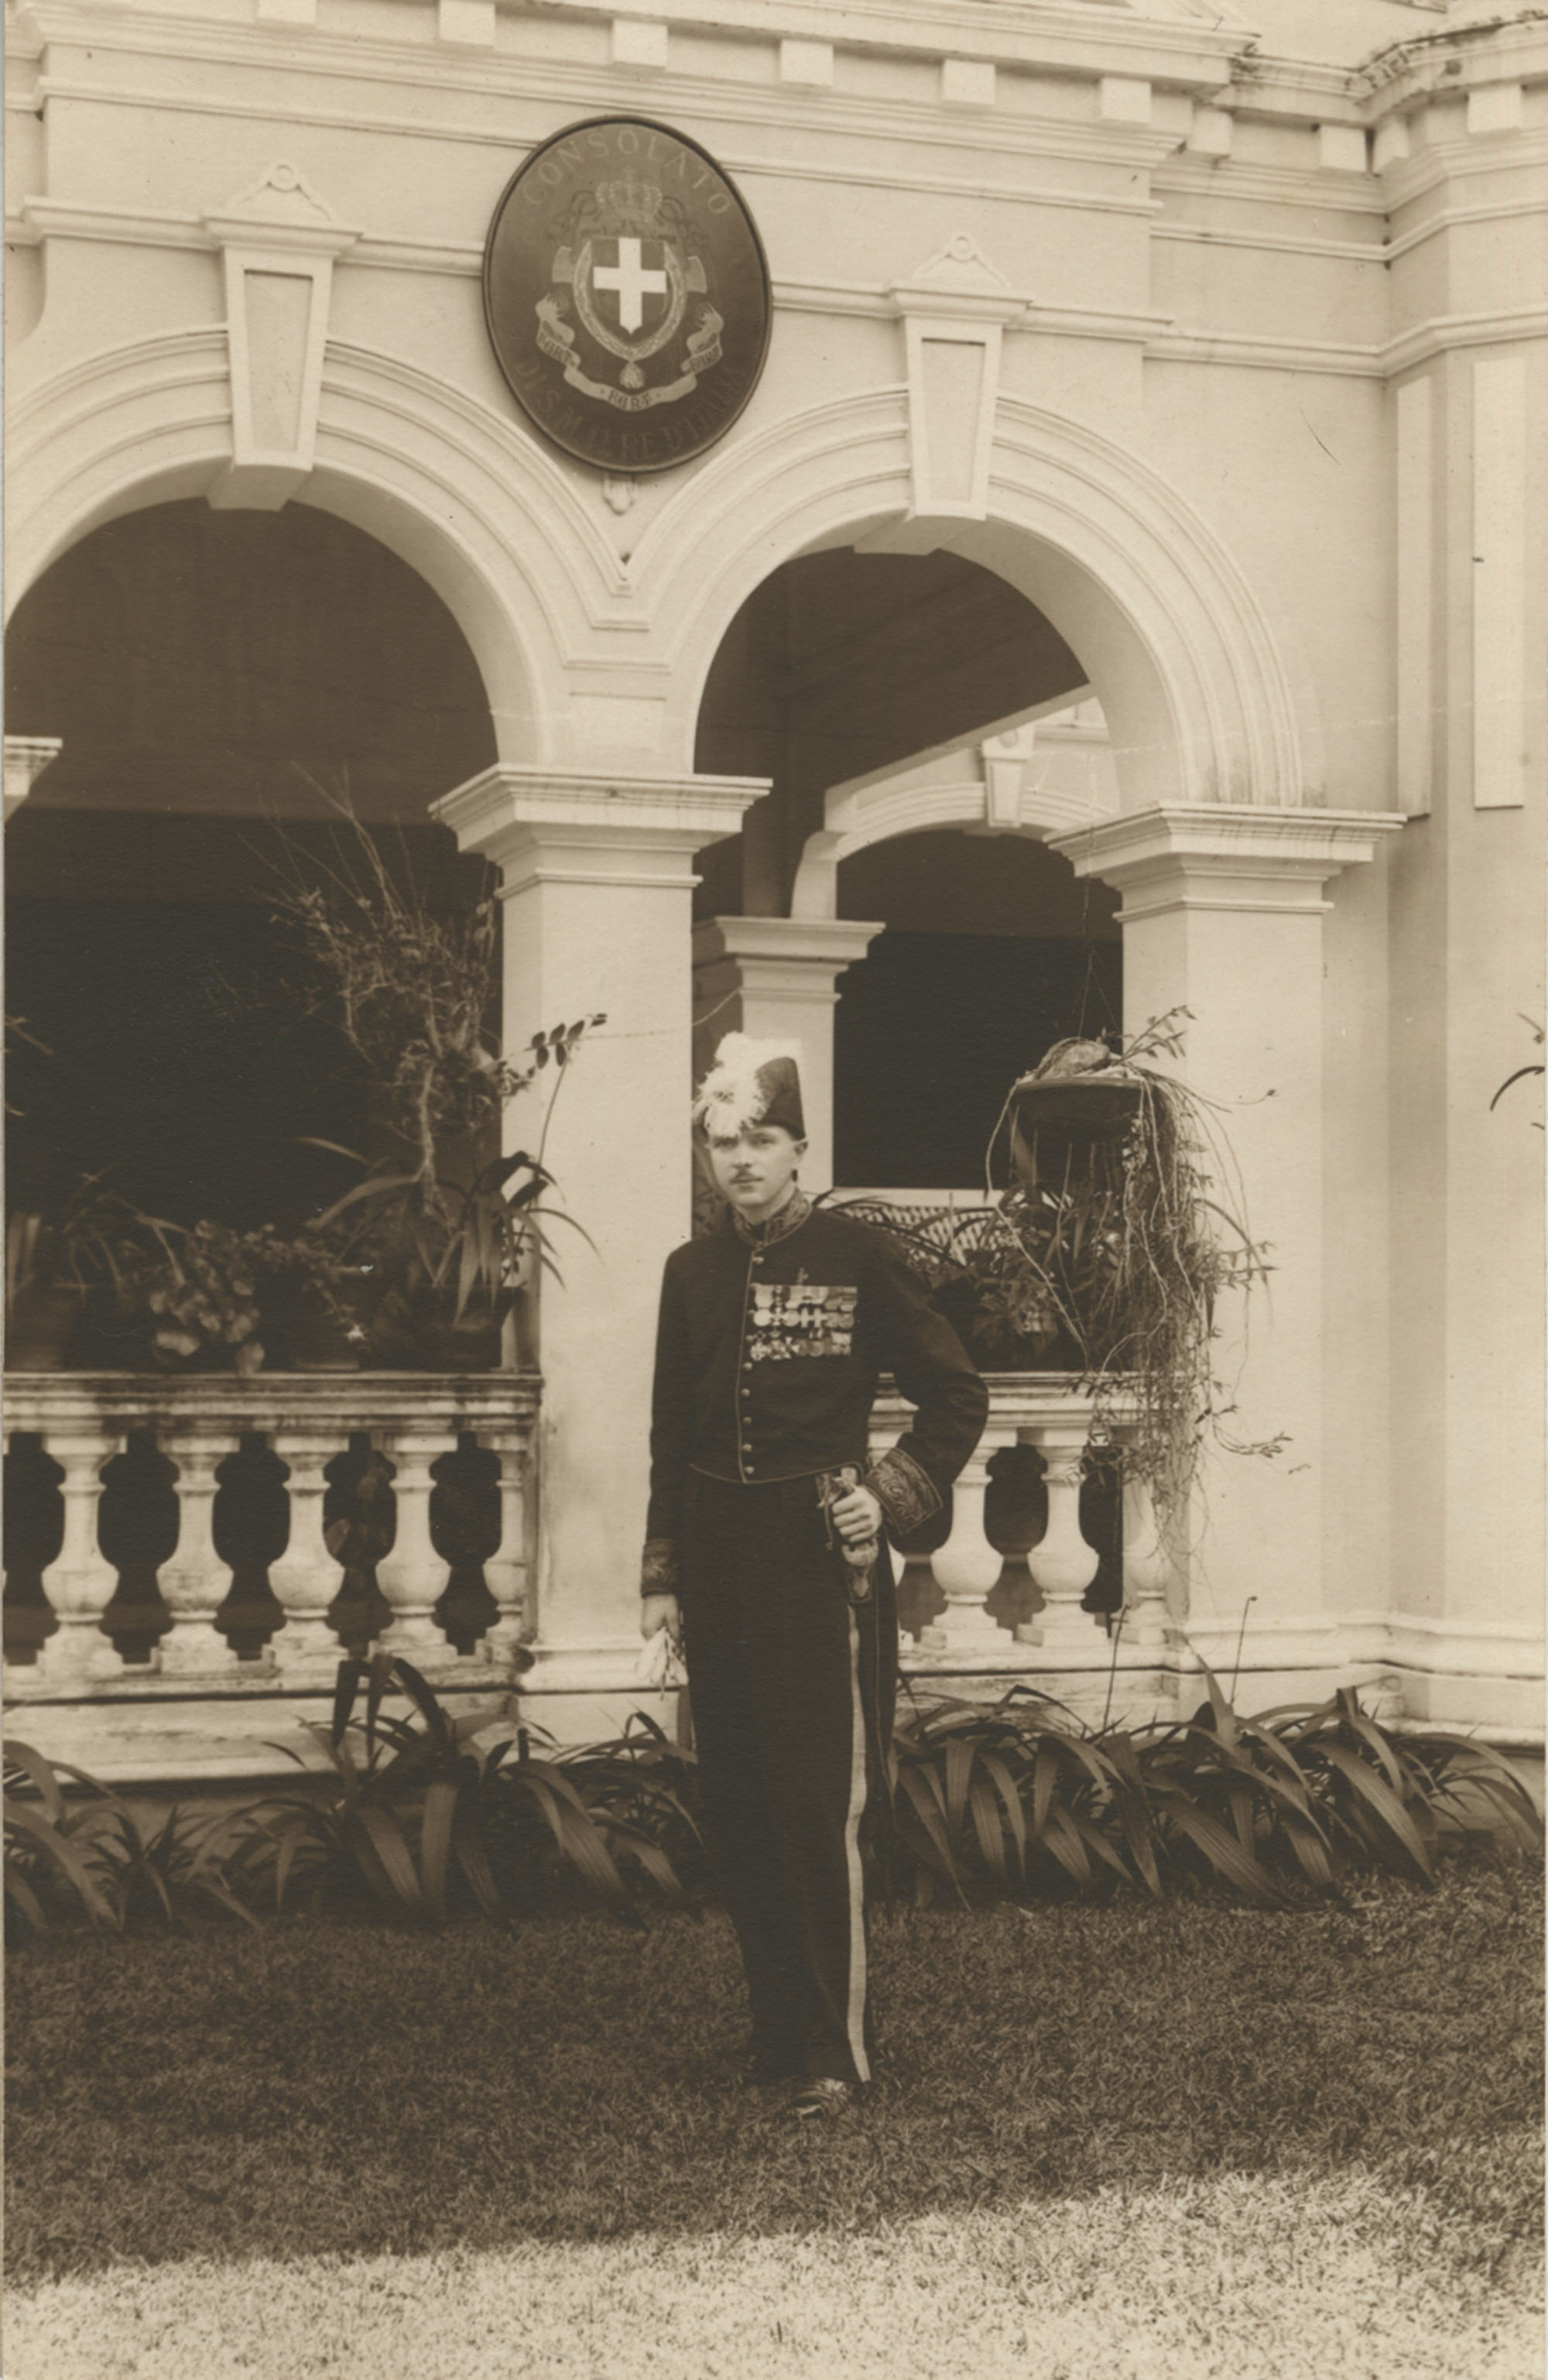 Mario Pansa in full dress uniform, Photograph 3